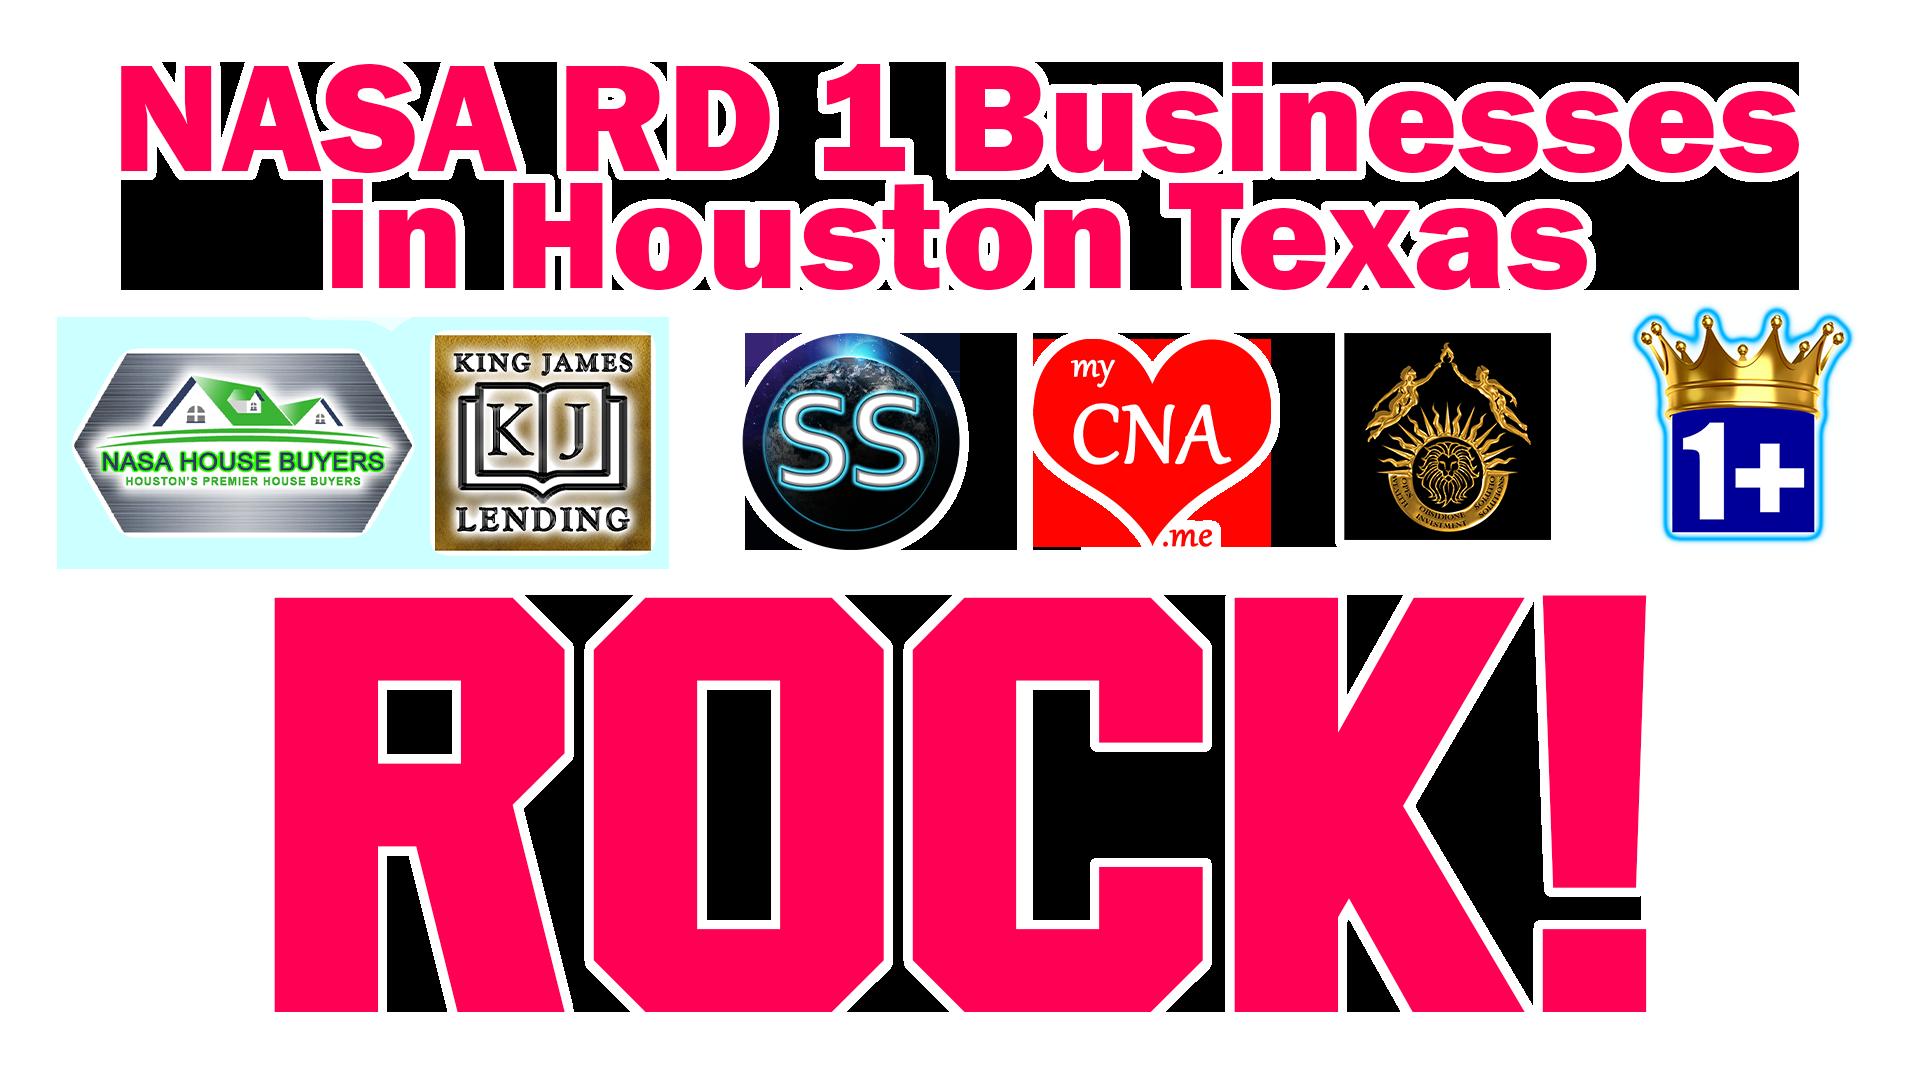 NASA RD 1 Businesses in Houston Texas